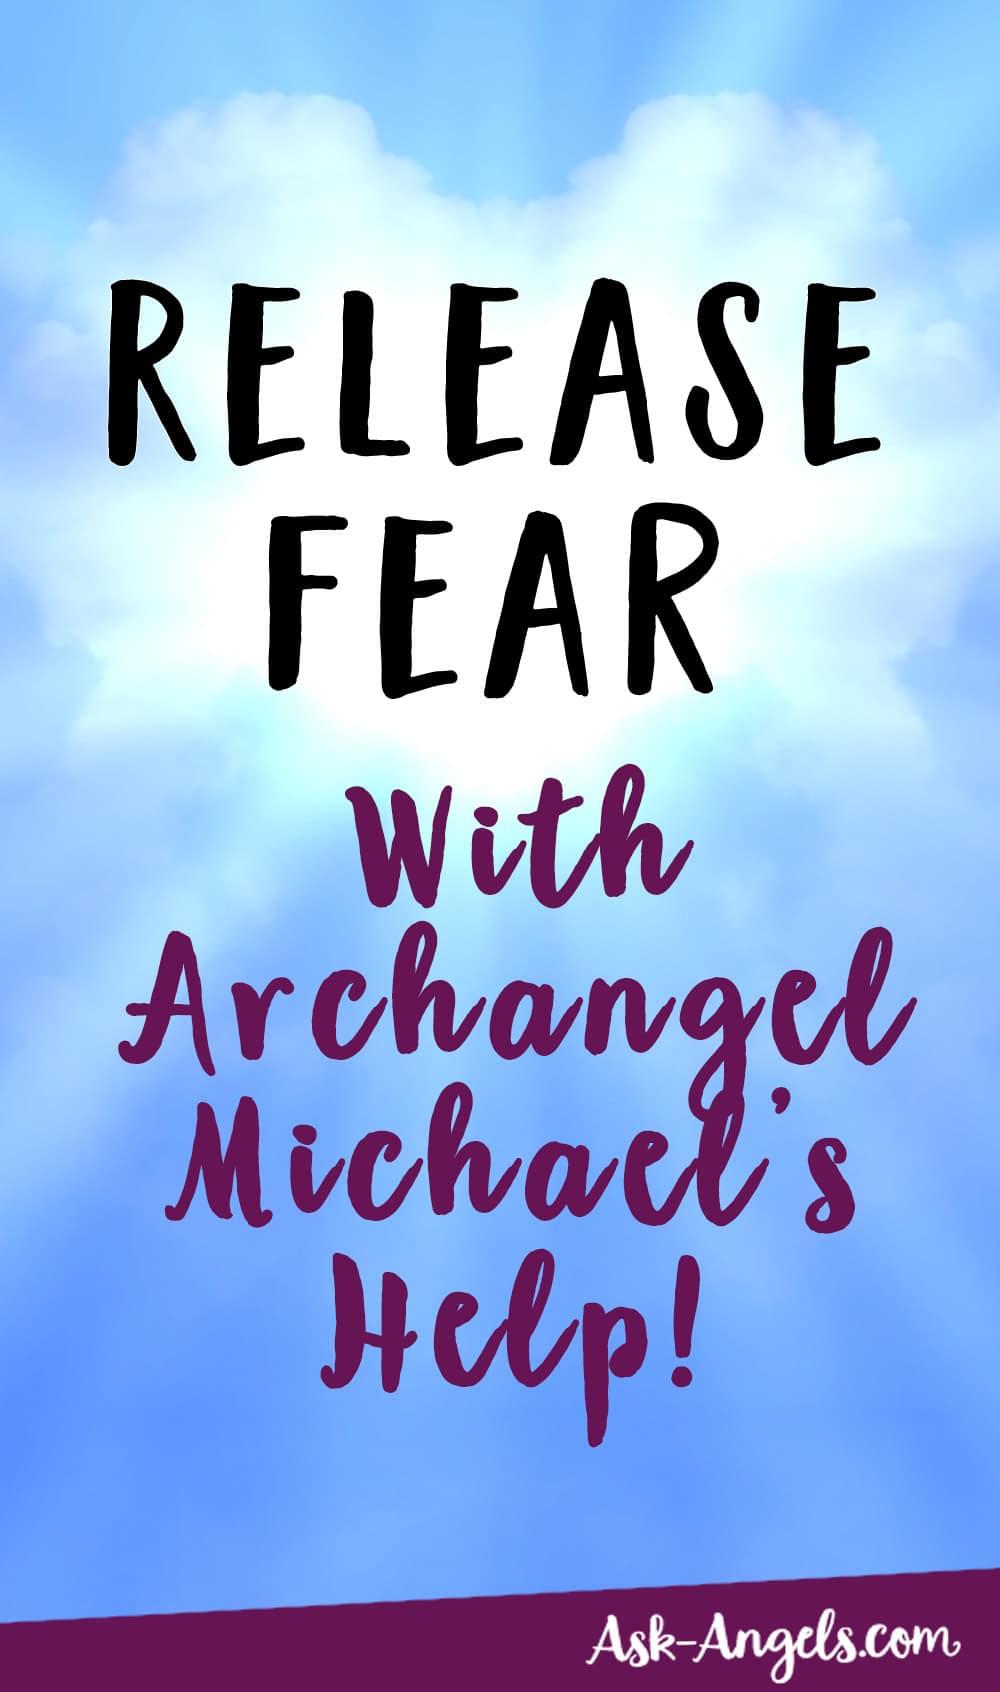 Release Fear with Archangel Michael's Help